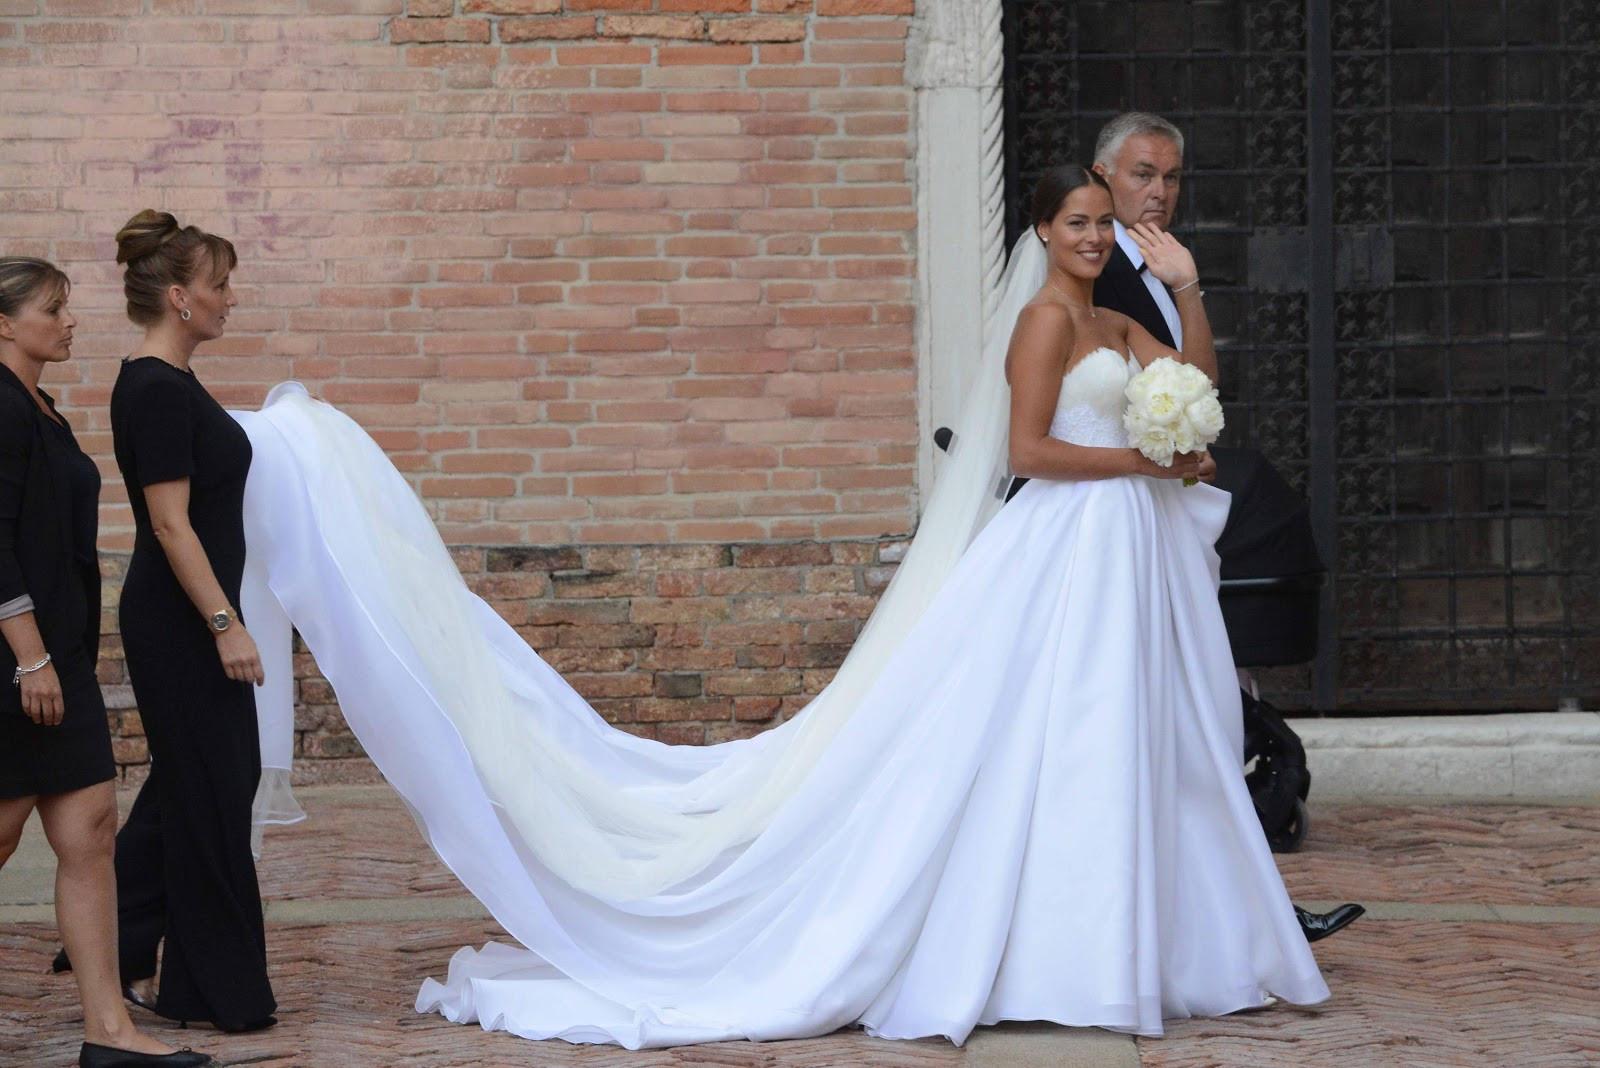 Ana Ivanovic Hochzeit  Ana Ivanovic Married Bastian Schweinsteiger Twice